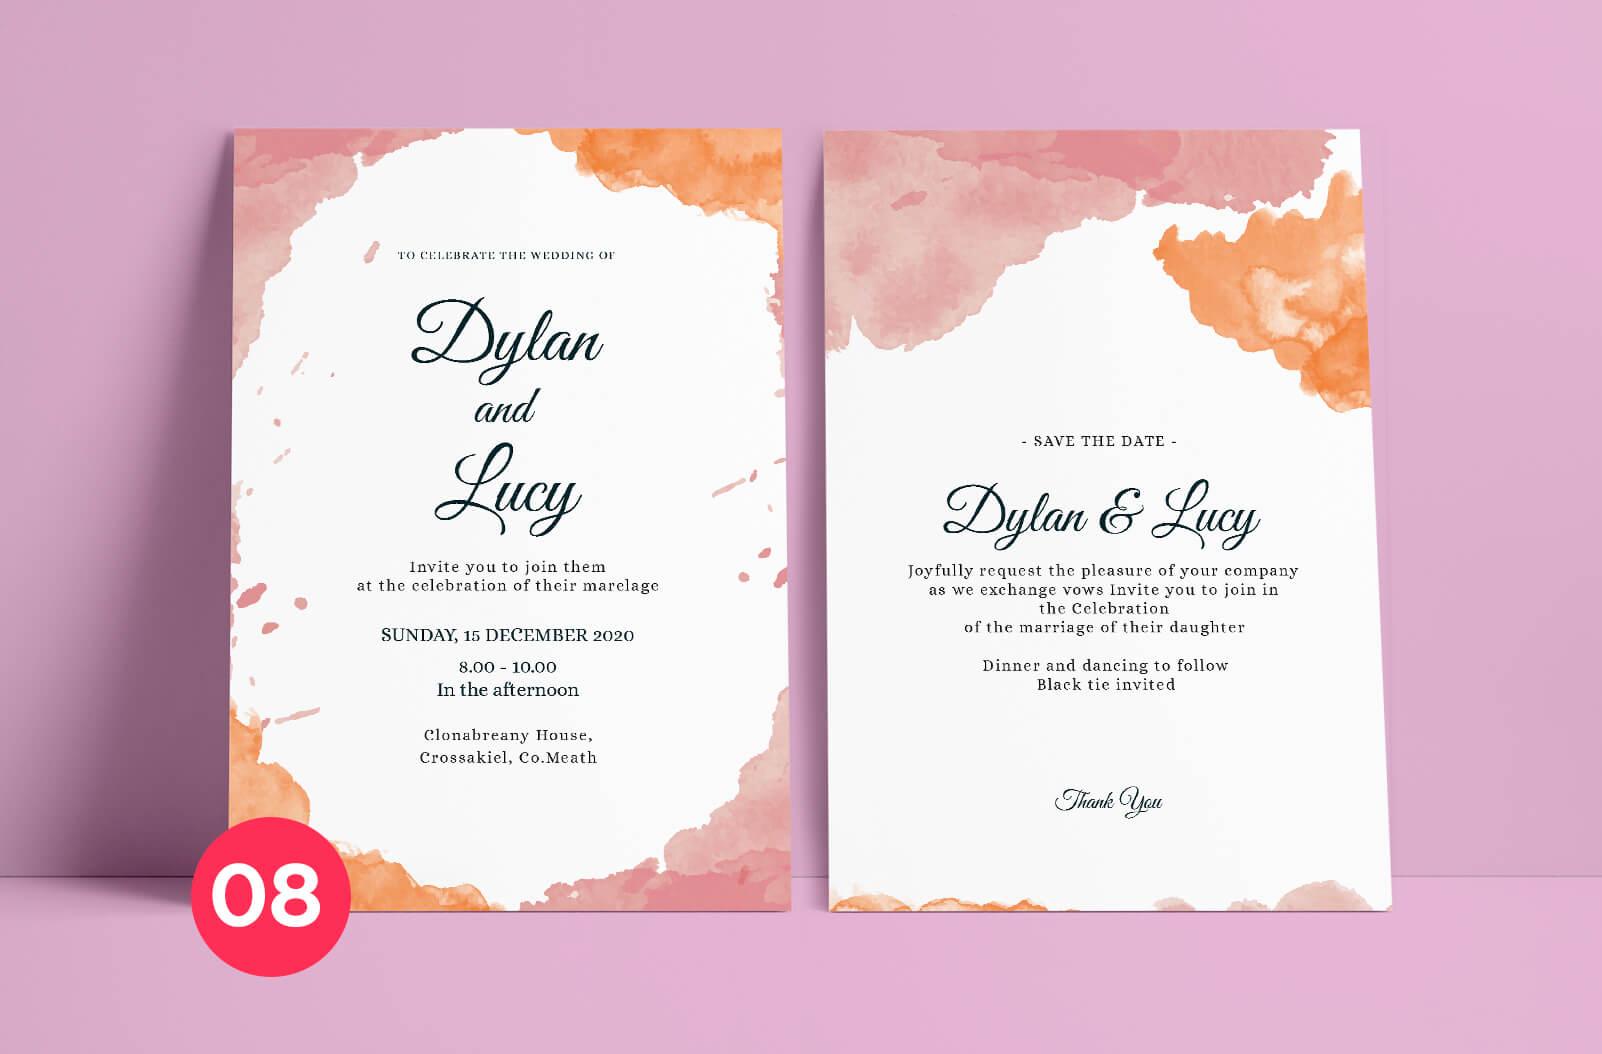 Wedding Invitation Mockup - Print Ready Dublin